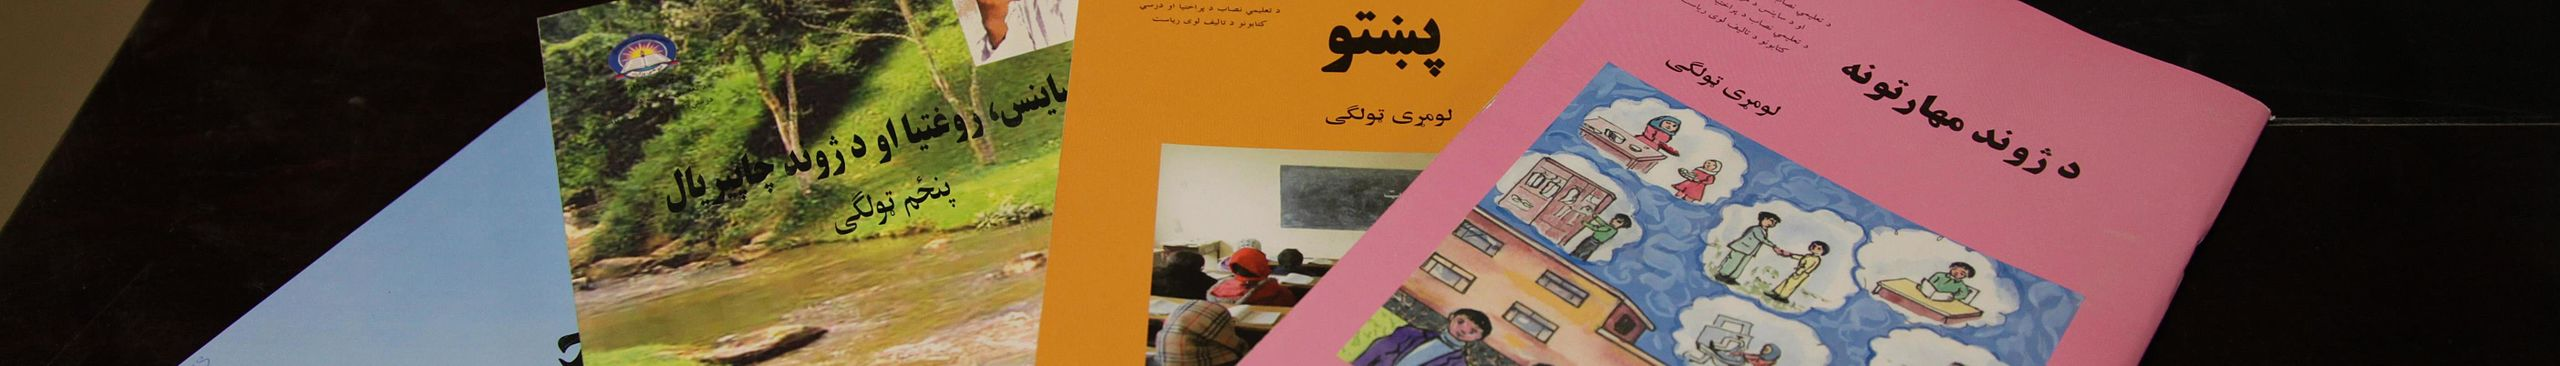 Pashto phrasebook – Travel guide at Wikivoyage